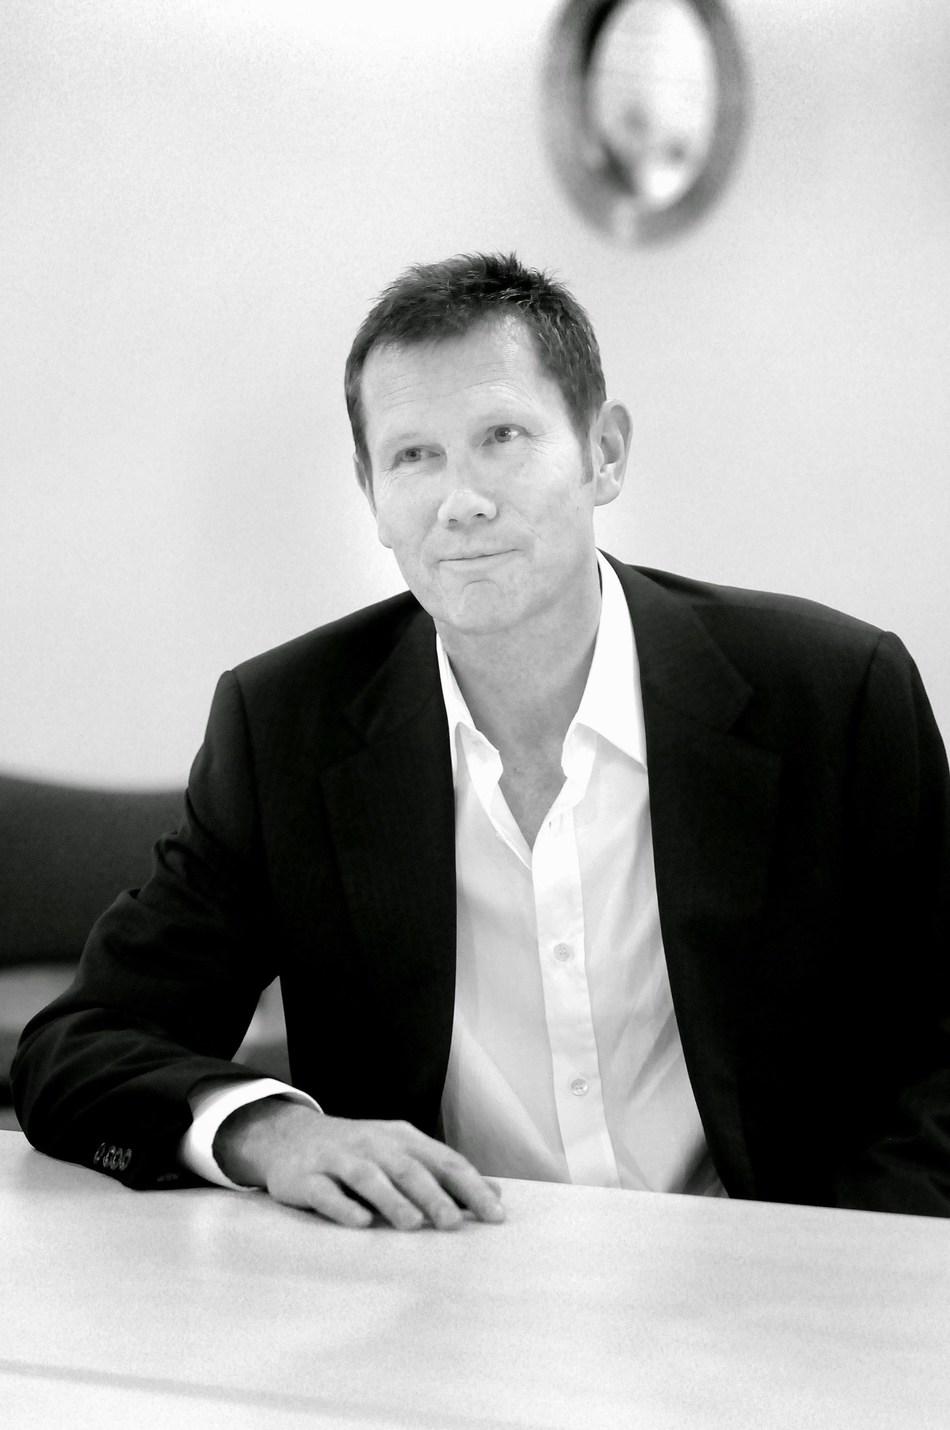 Former easyJet CIO Trevor Didcock joins the Futurice board. (PRNewsfoto/Futurice)